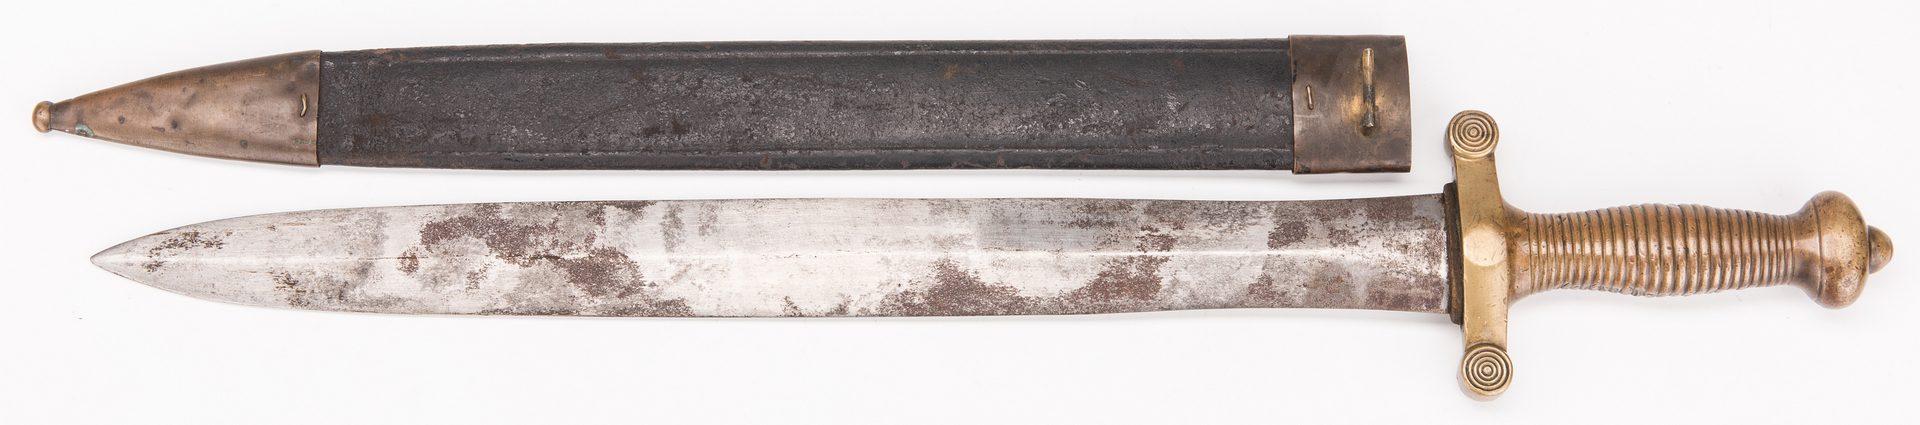 Lot 521: 4 Charles H. Boyd Civil War Era Military Weapons/Flasks